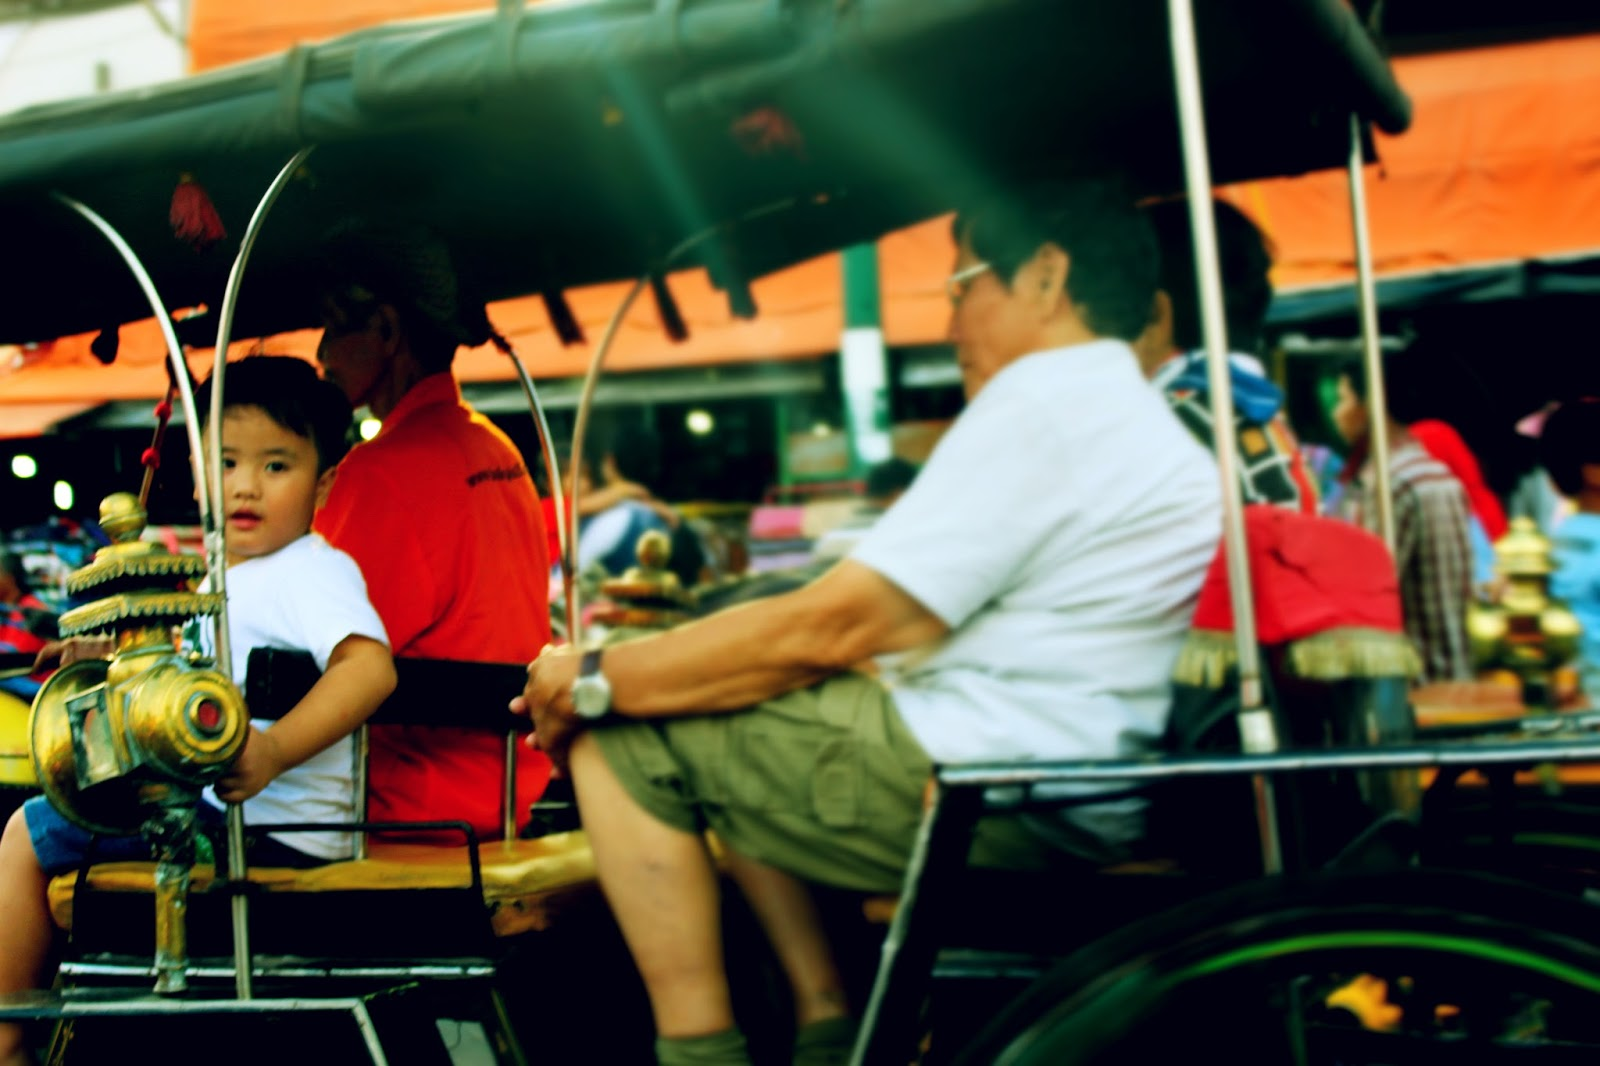 Yogyakarta Salah Satu Tempat Tujuan Wisata Terkenal Dunia